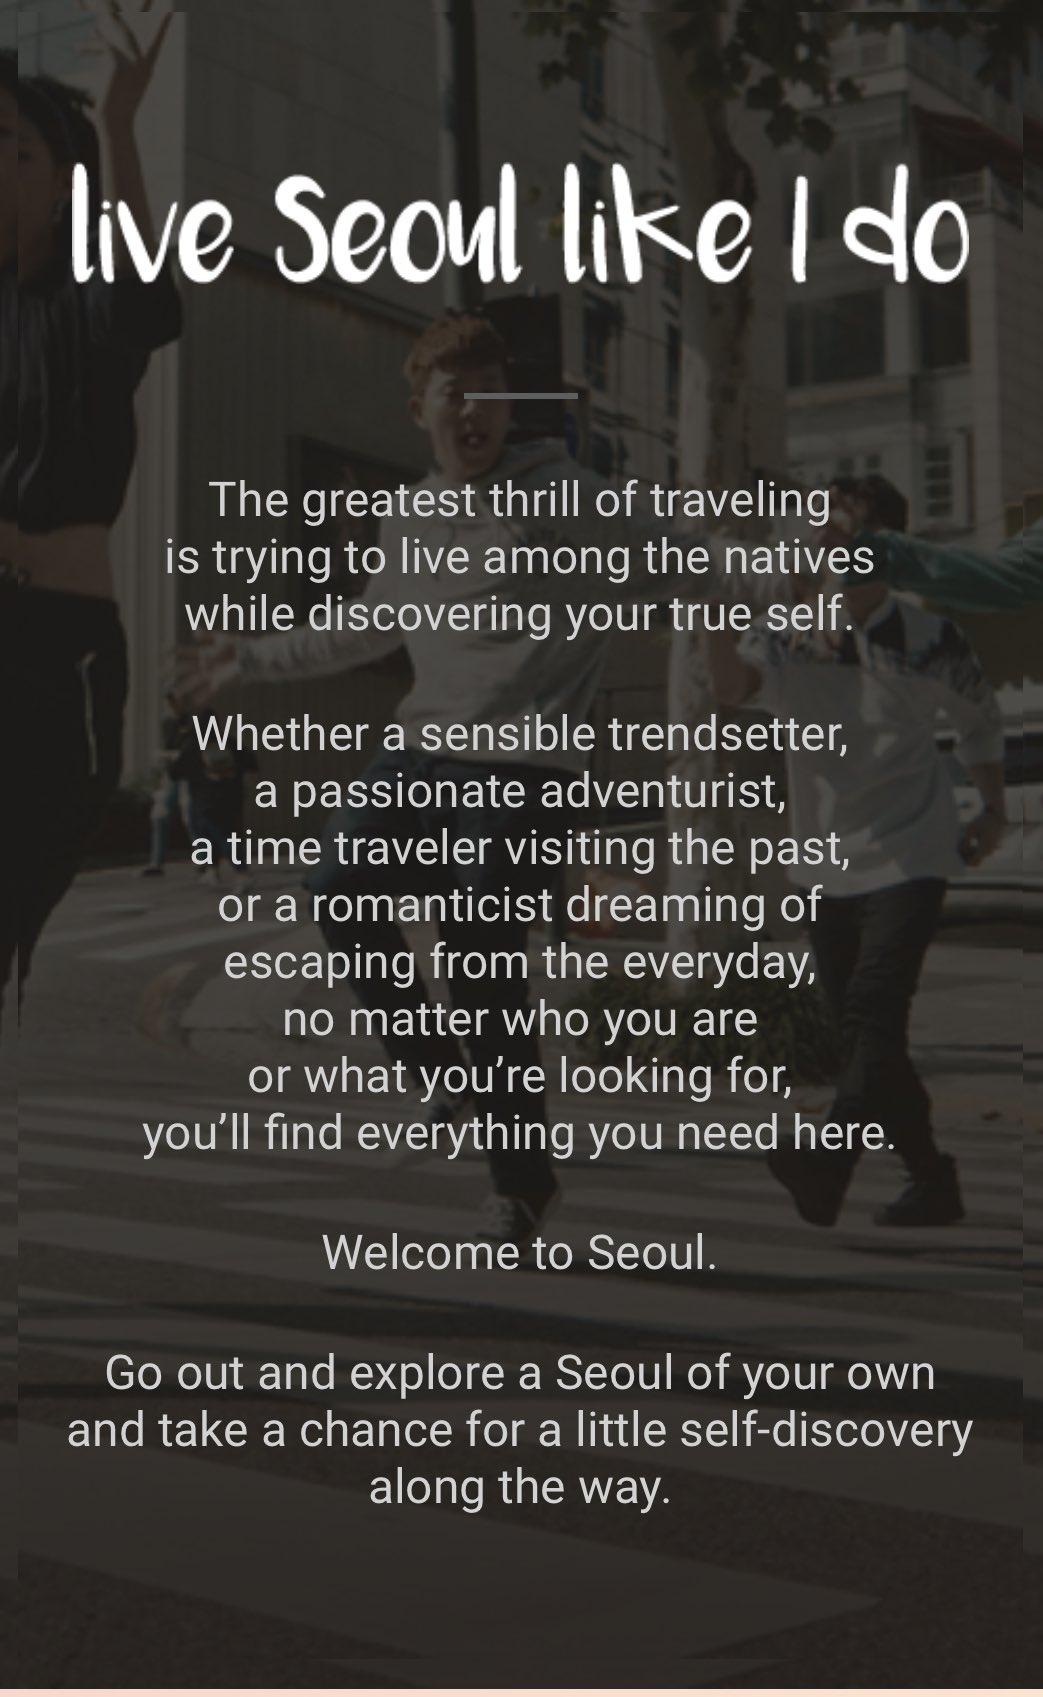 Live Seoul Like I Do  Live Seoul like #BTS  does! #myseoulplaylist @BTS_twt @bts_bighit https://t.co/bEIrJvx31t https://t.co/hDYQxOfReb